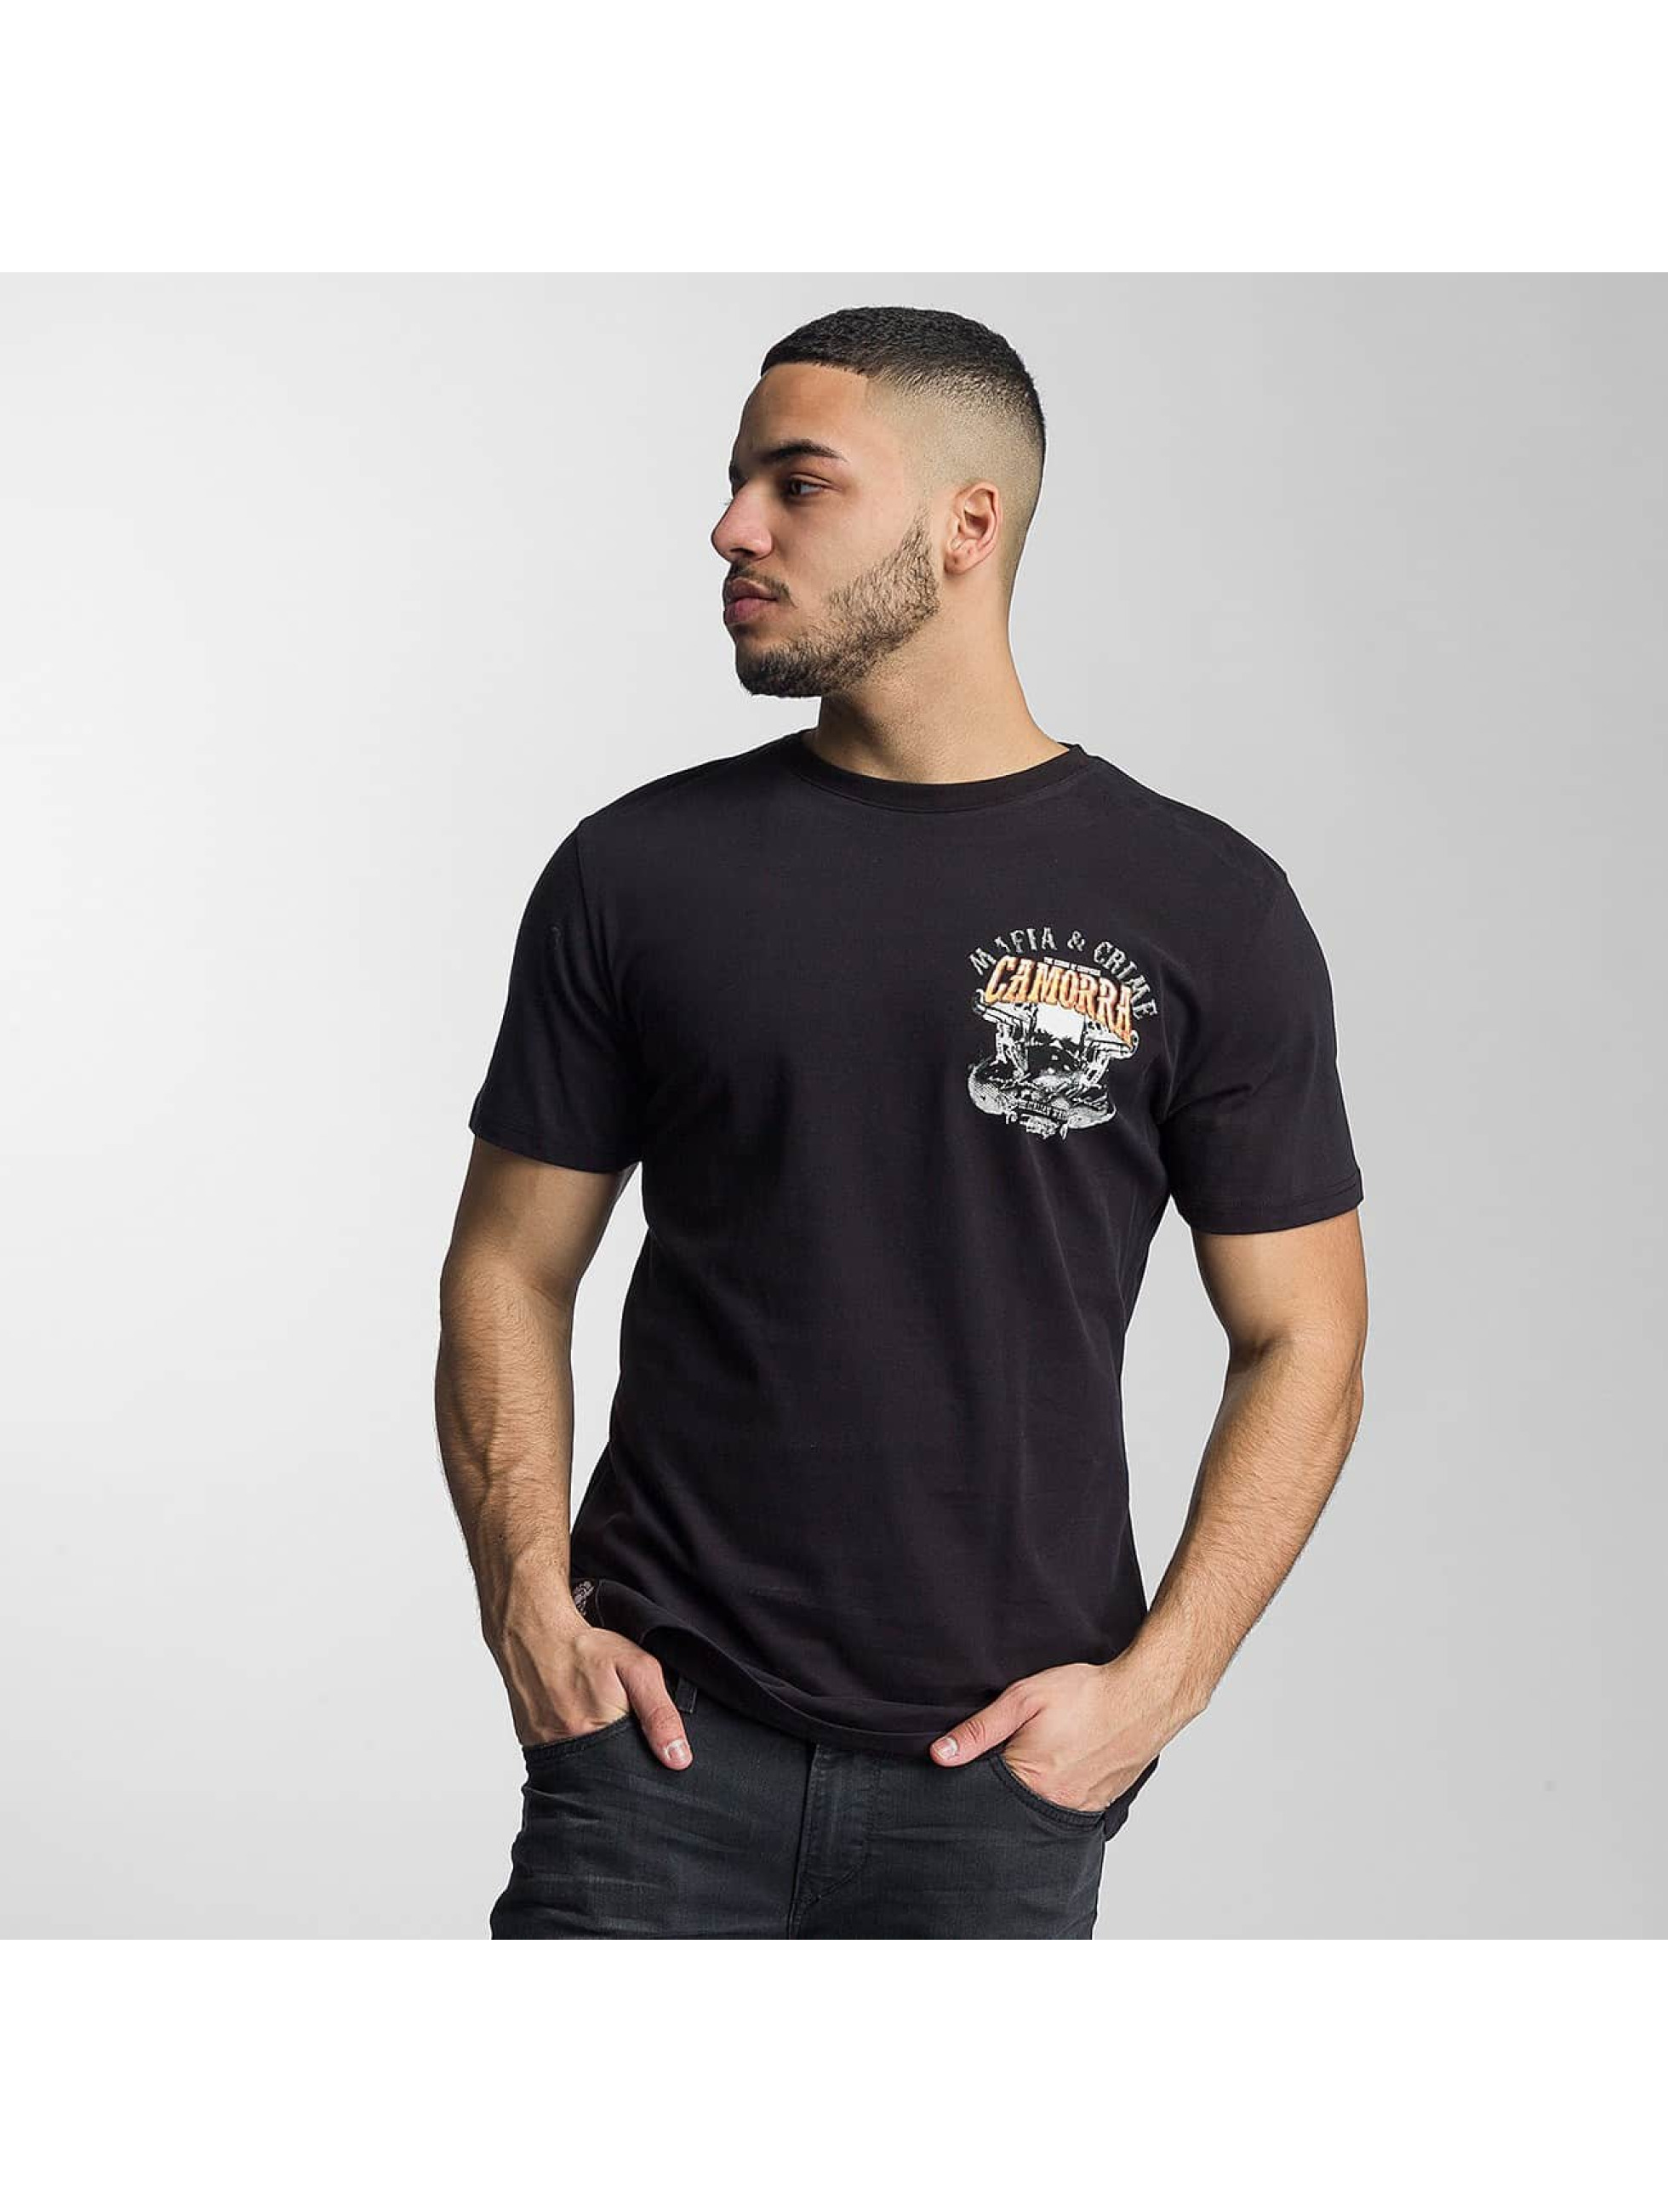 Mafia & Crime T-Shirt Camorra black